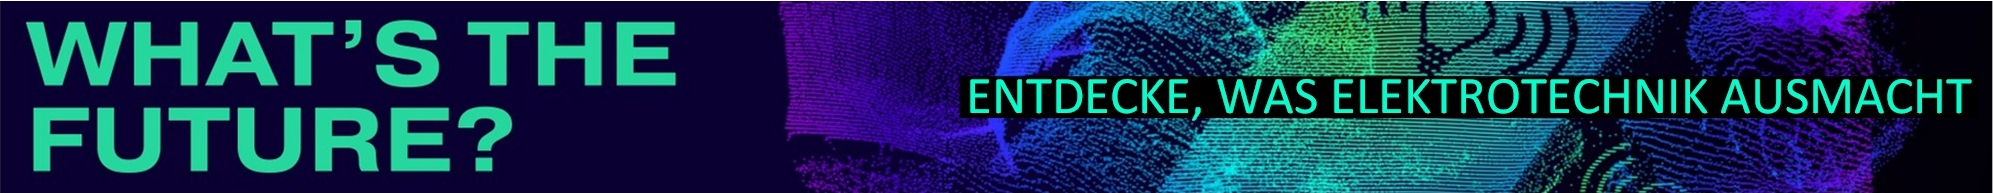 Link auf ET&IT website